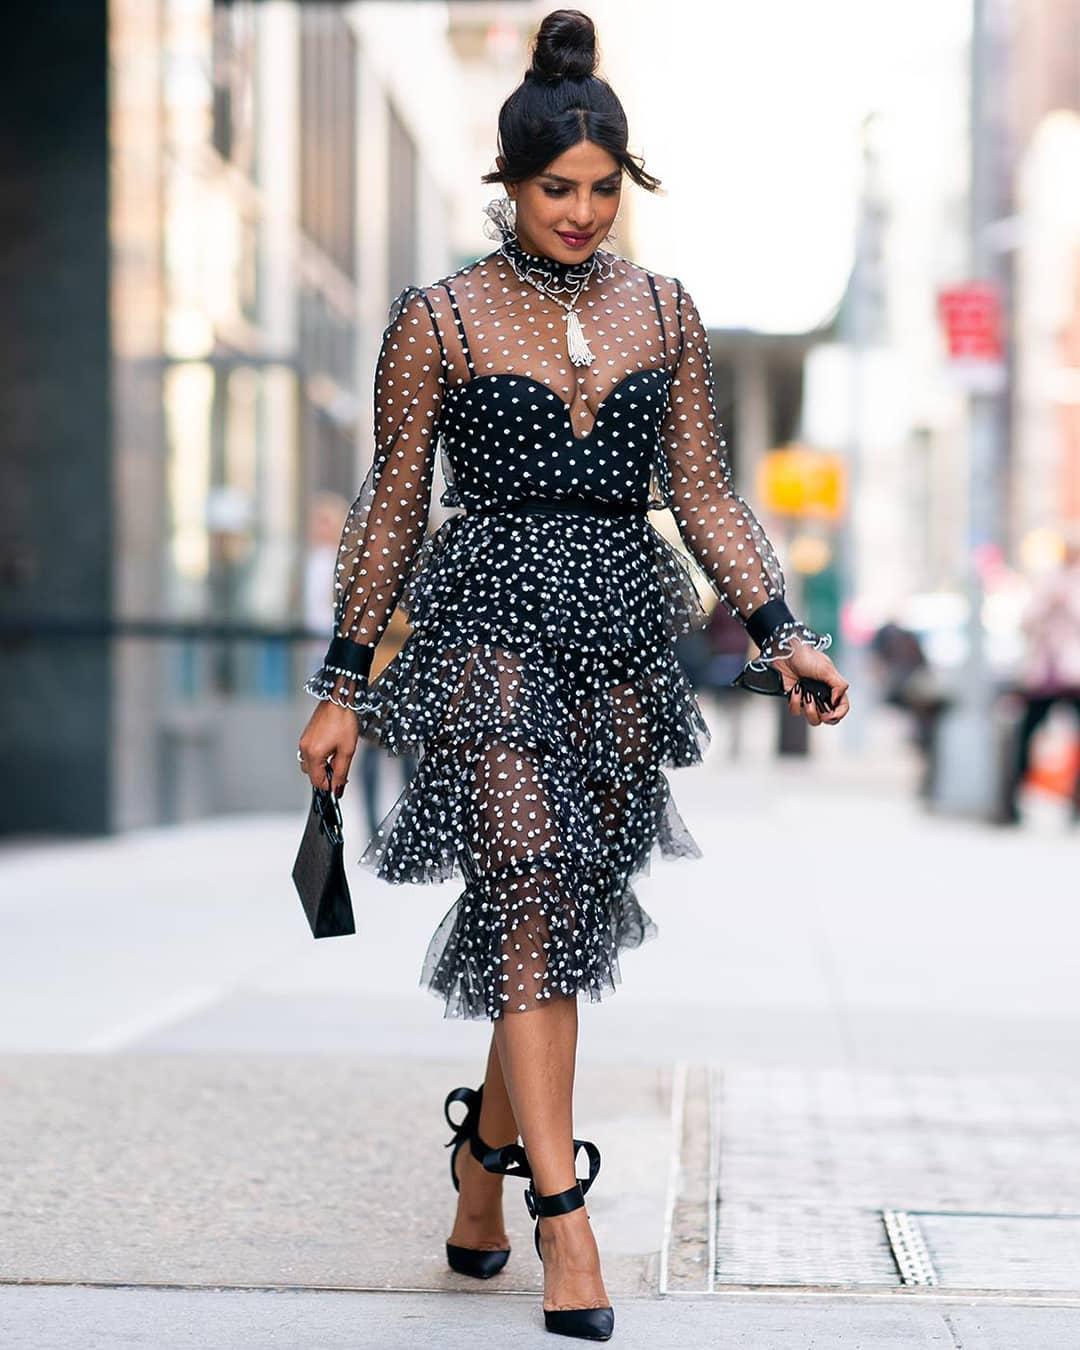 Priyanka Chopra in black dress photo